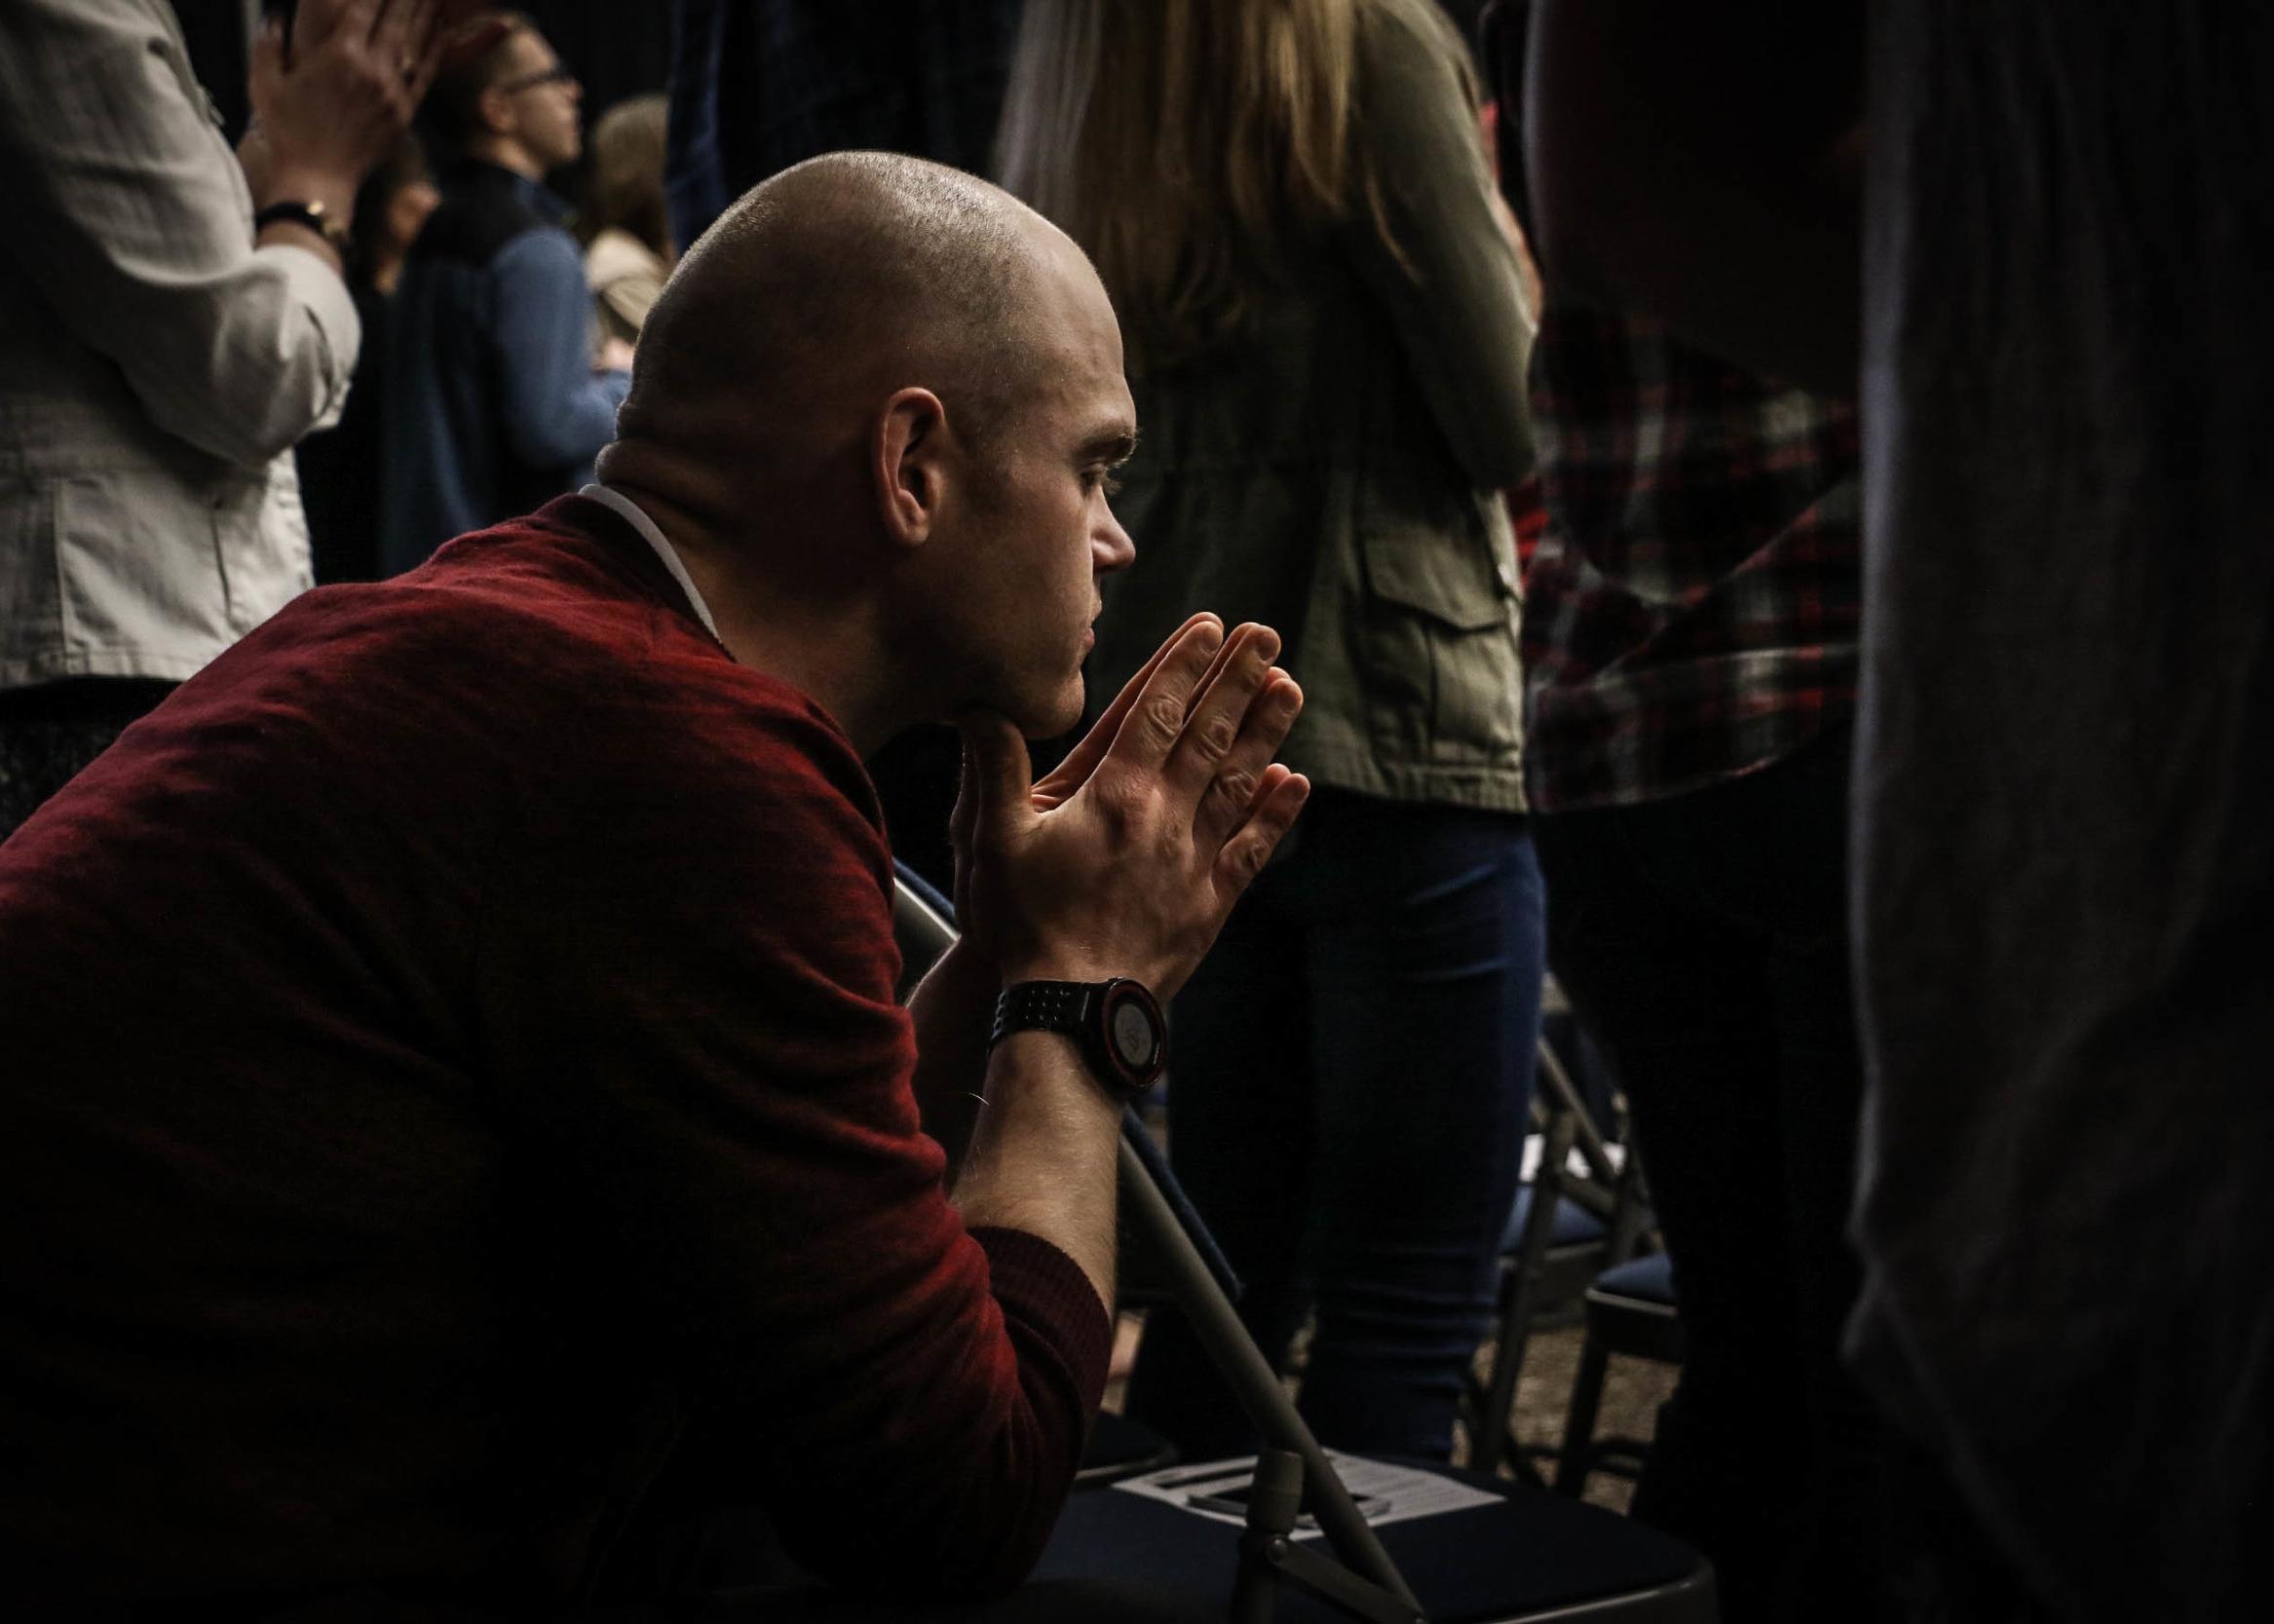 UNCEASING PRAYER - Believing firmly in the power of prayer.